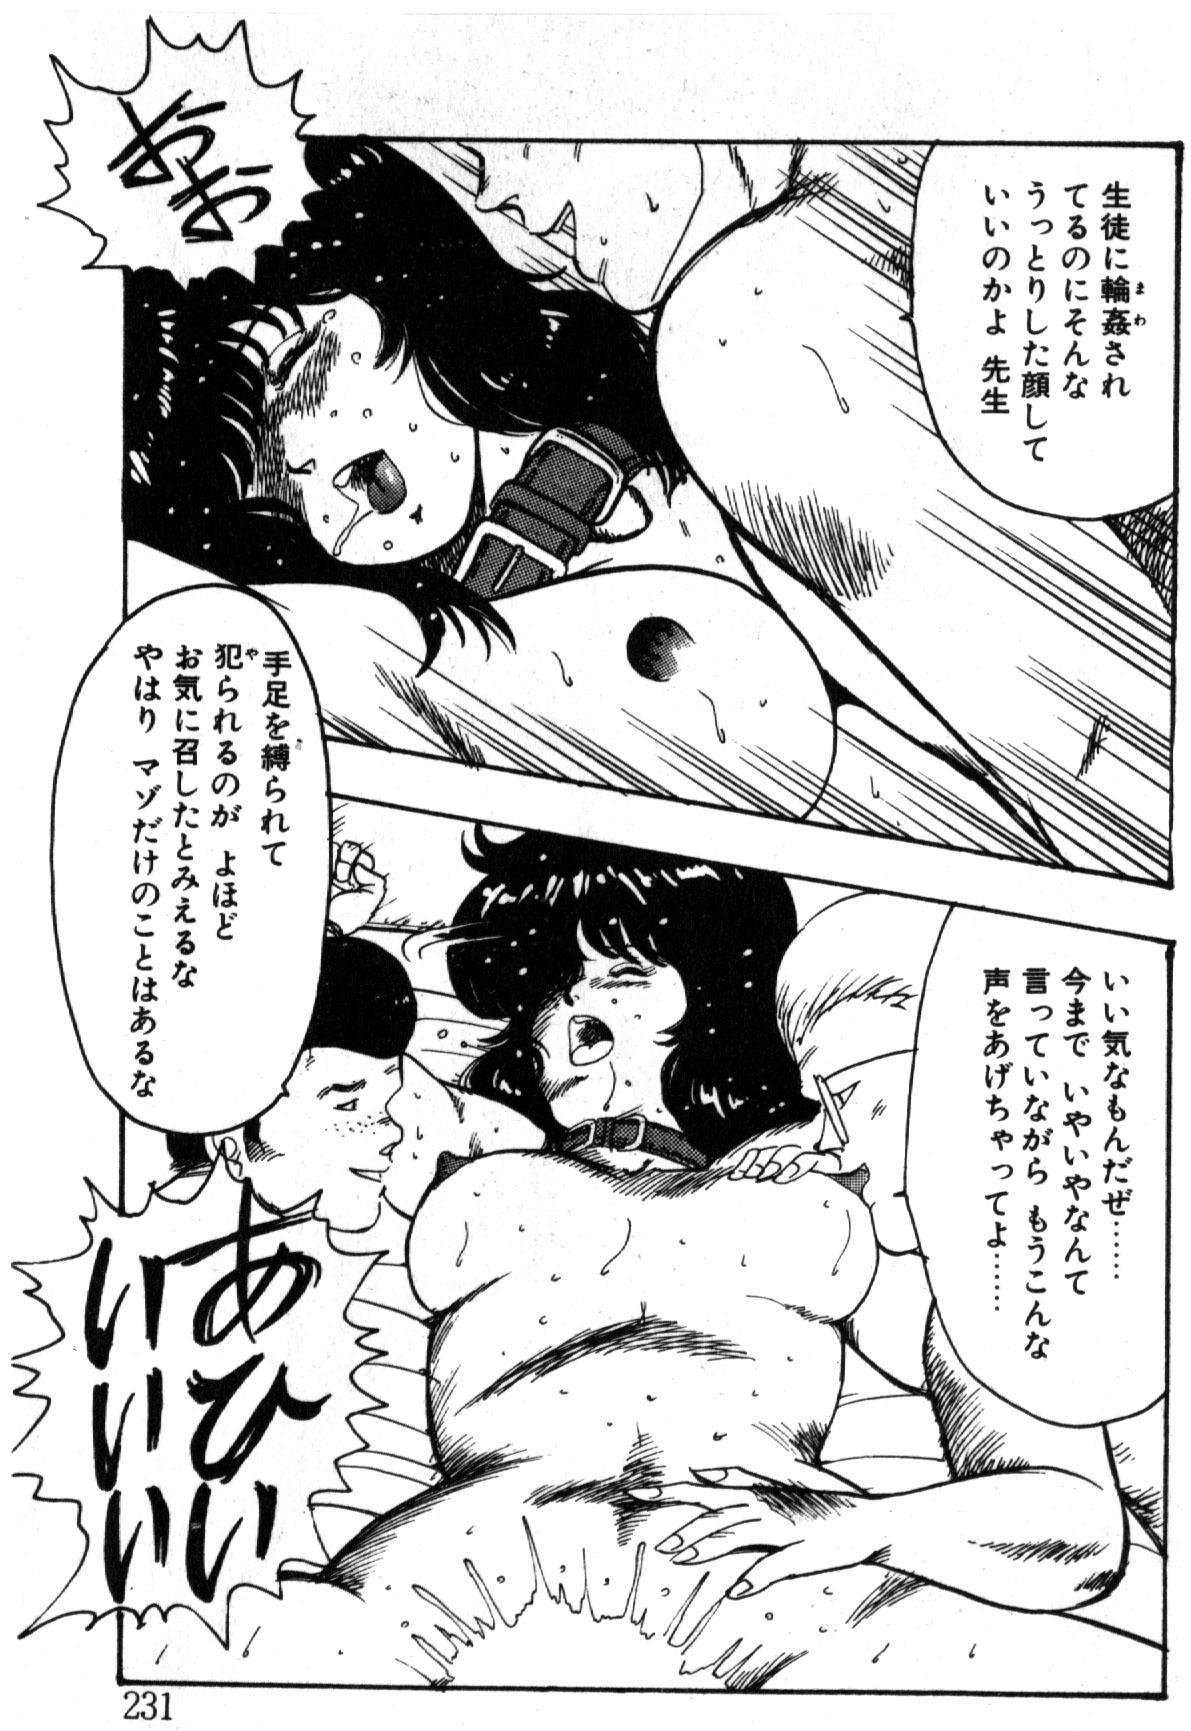 Keiko Sensei no Kagai Jugyou - Keiko Sensei Series 1 230